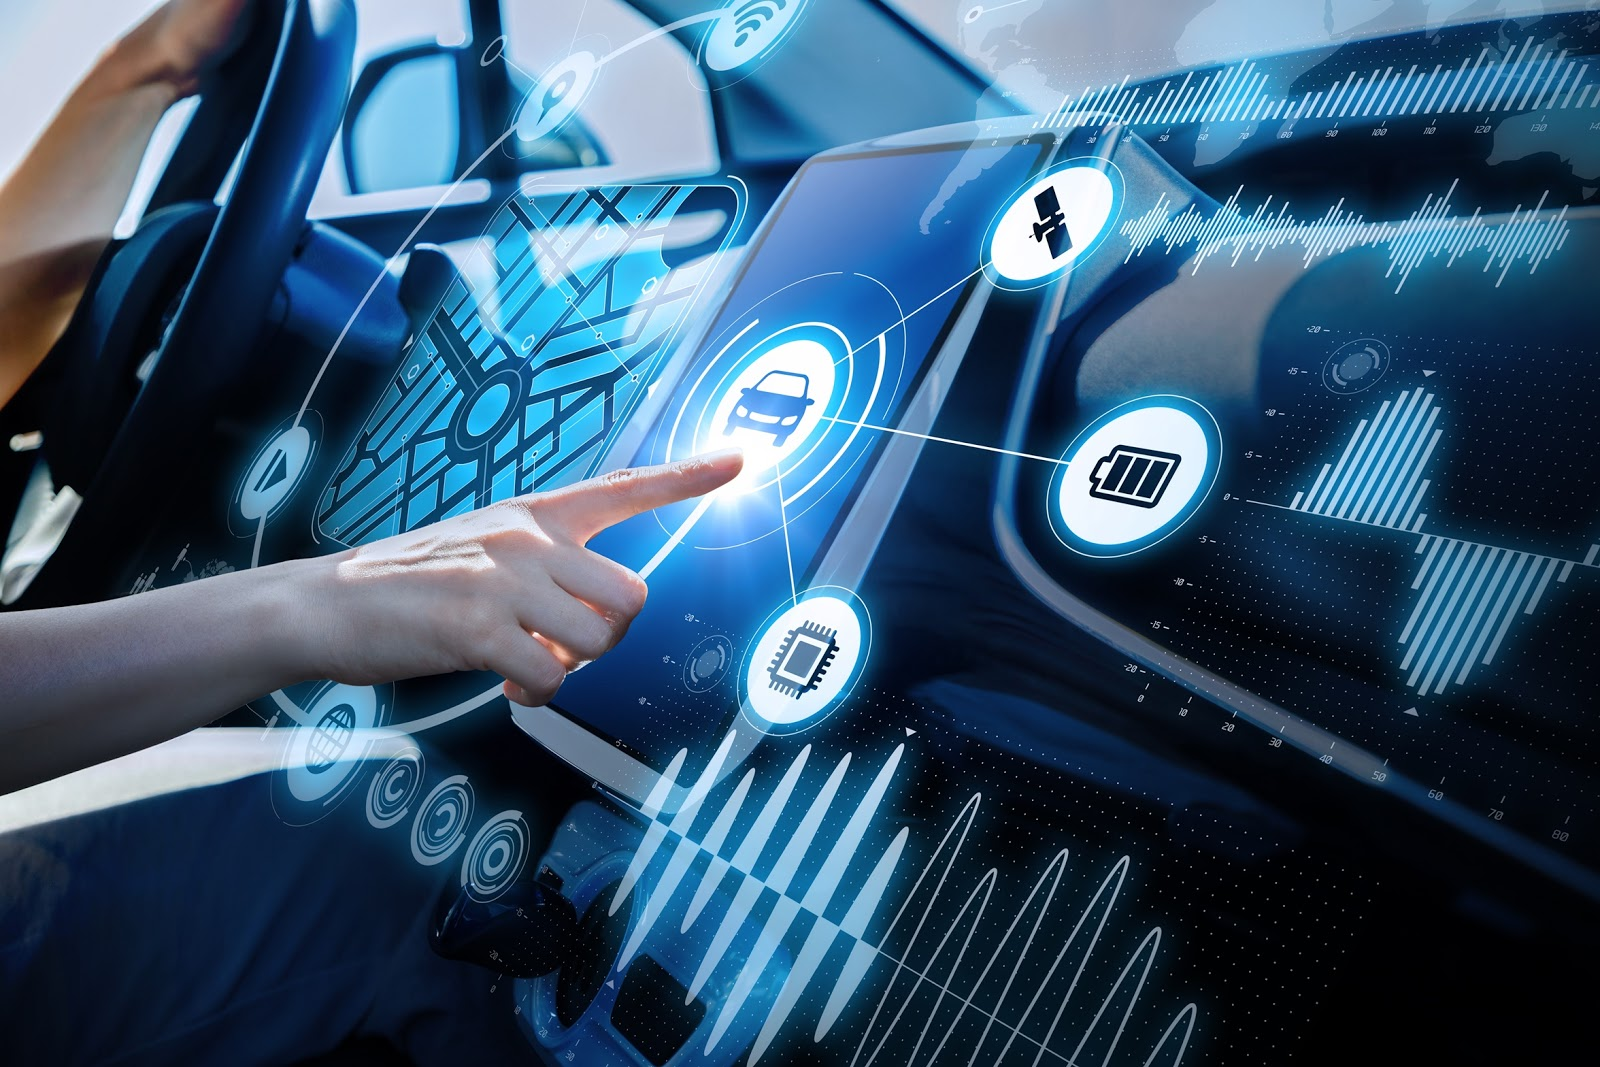 Huawei จับมือกลุ่มผู้ผลิตรถยนต์ พัฒนาระบบนิเวศอุตสาหกรรมยานยนต์ขับเคลื่อนโดยเทคโนโลยี 5G